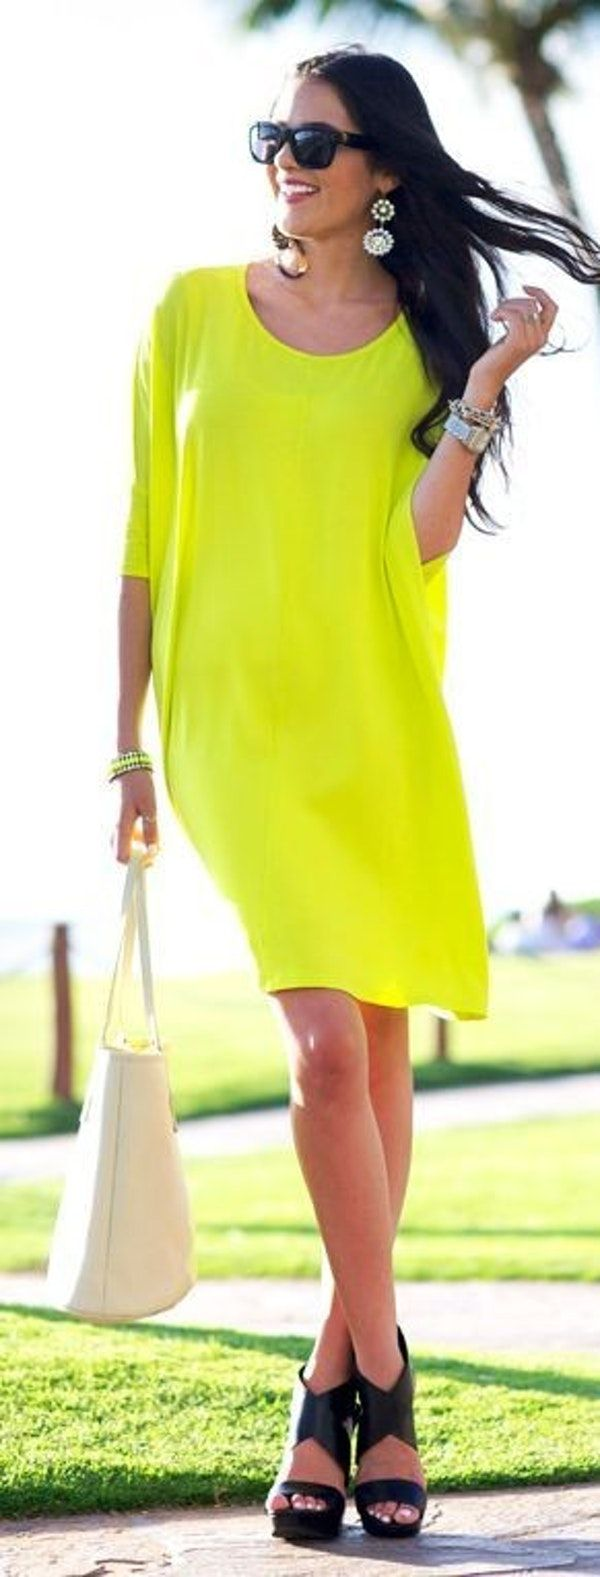 Neon Yellow Dress |Pink Peonies